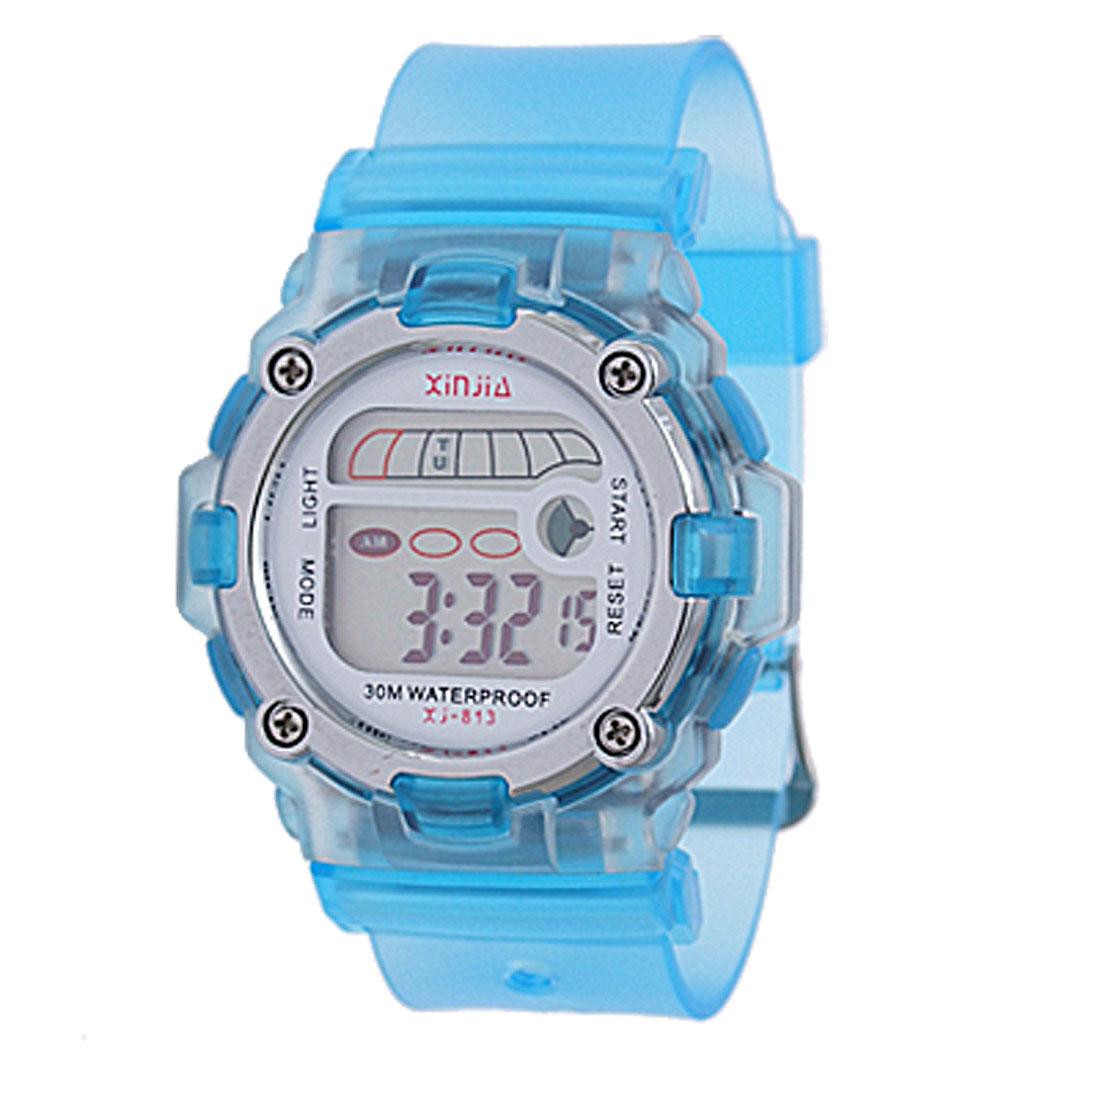 Blue Soft Plastic Band Round Case Sports Digital Watch